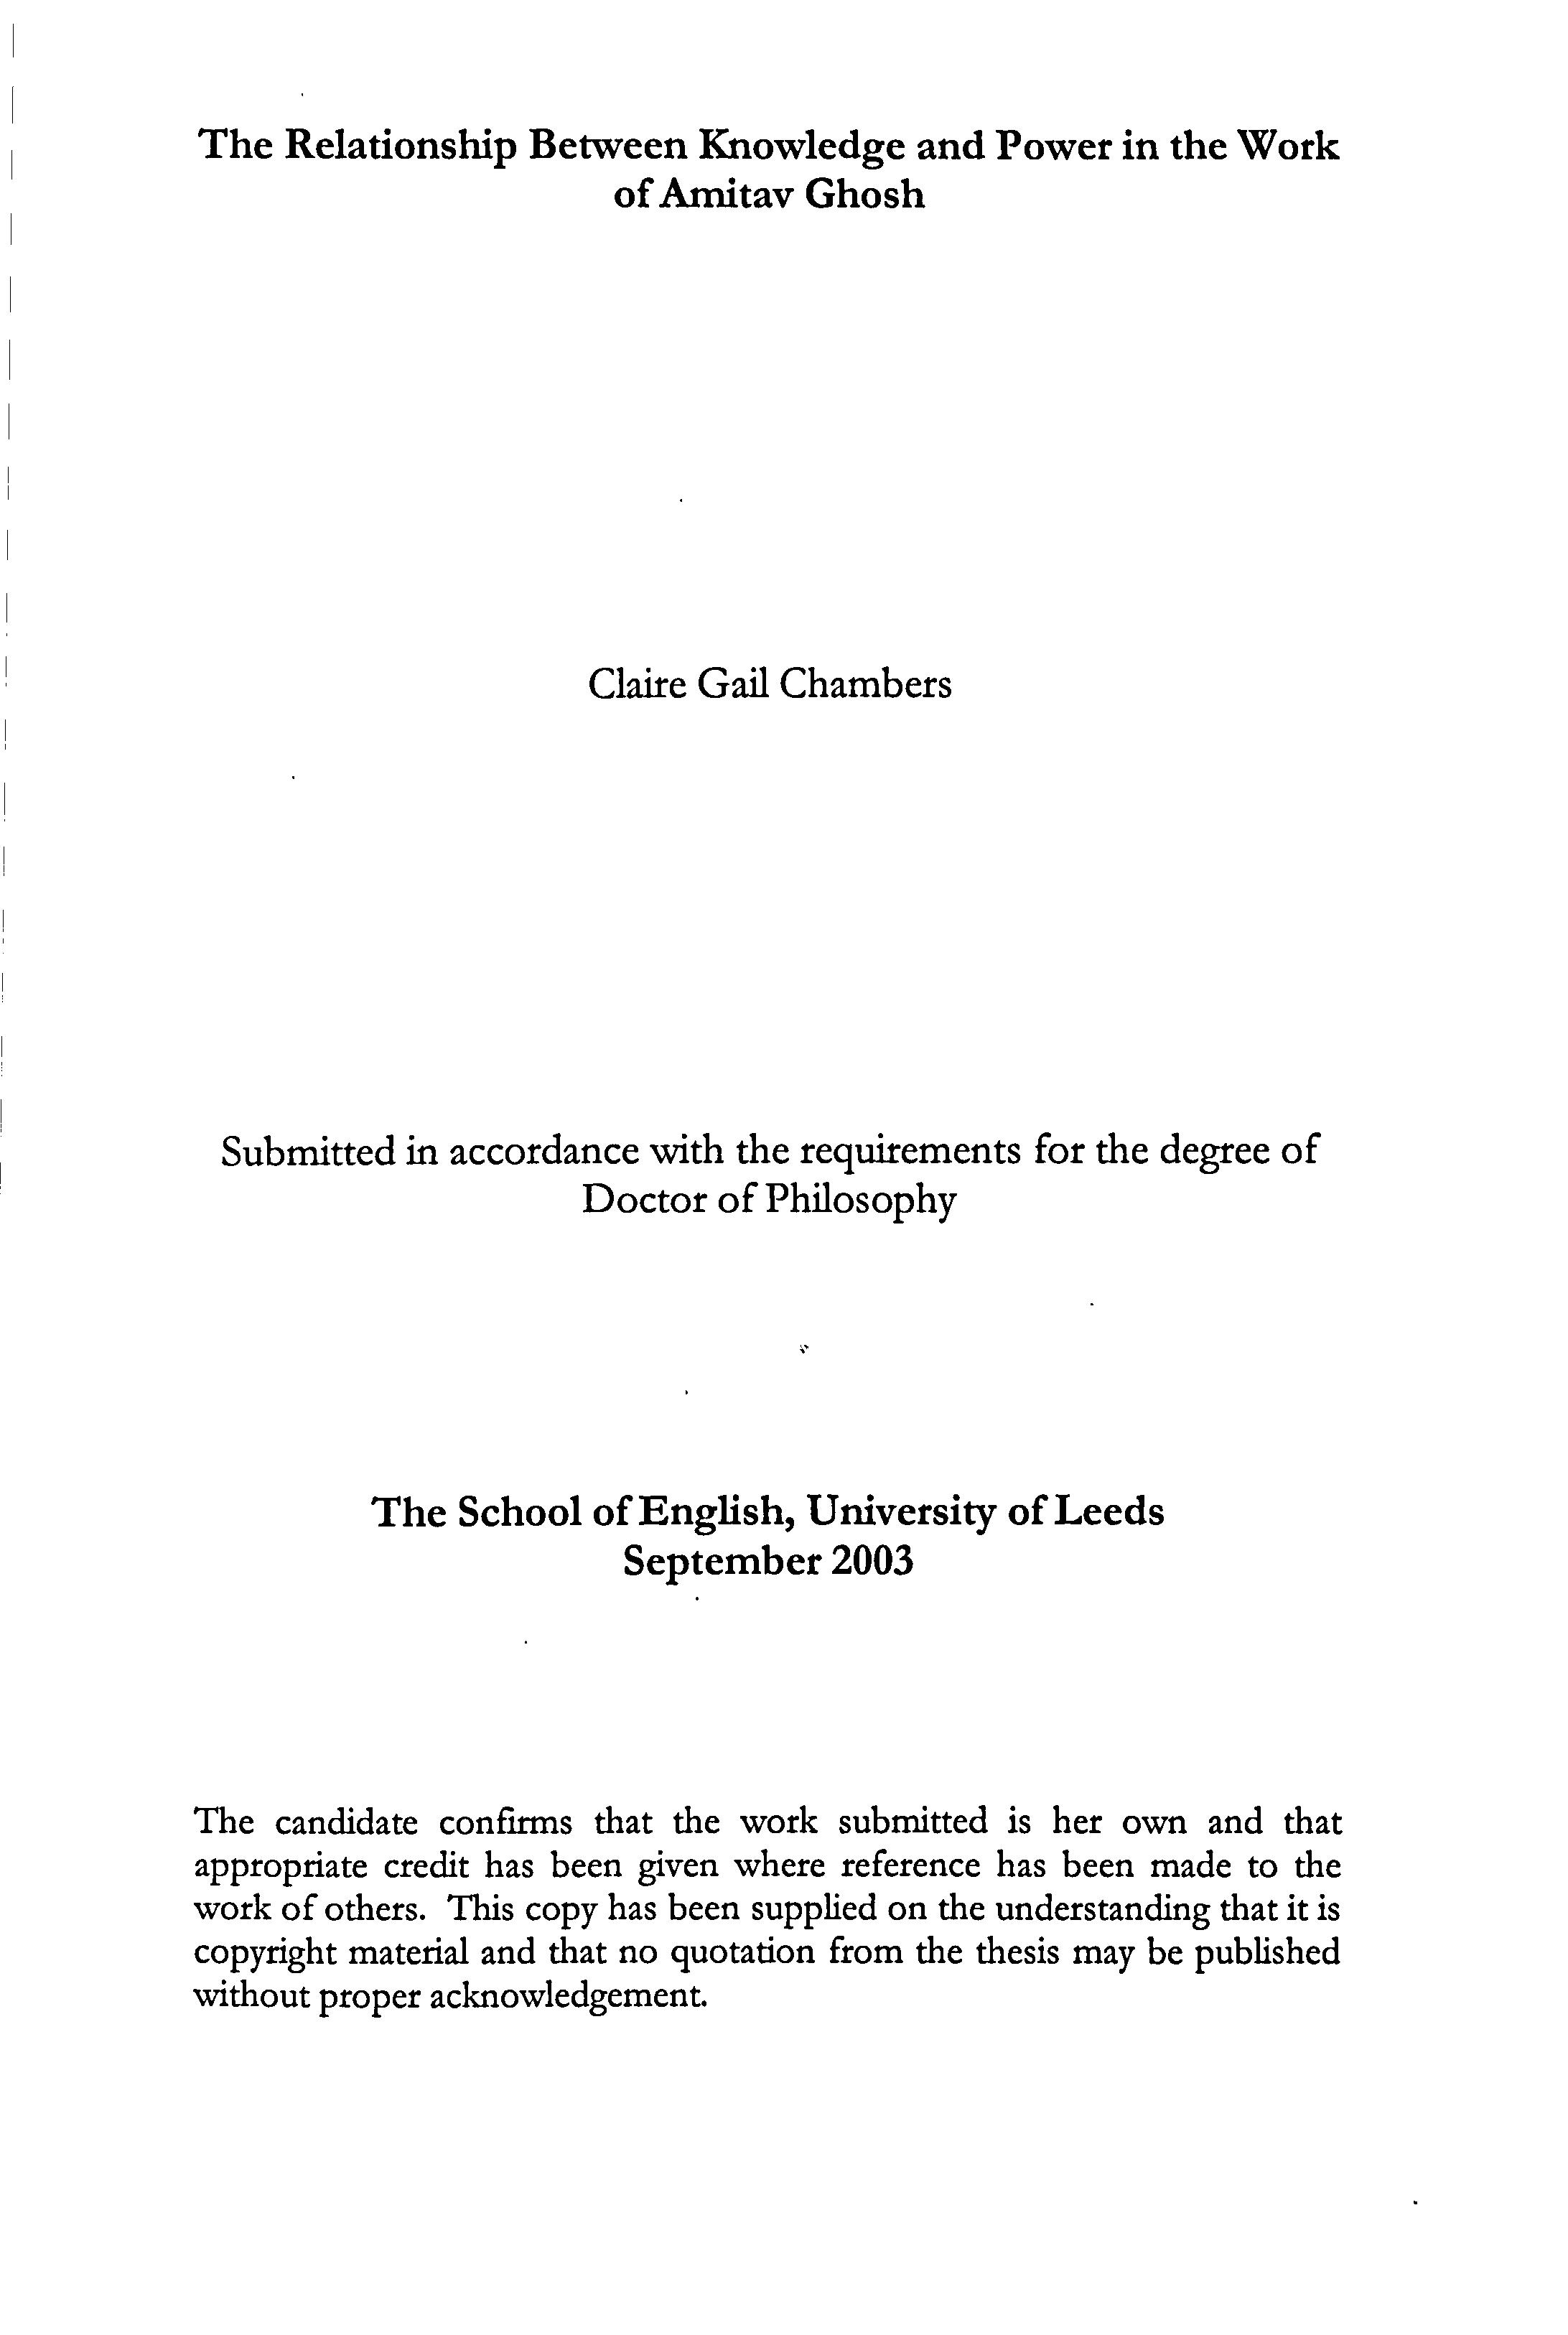 thesis on amitav ghosh